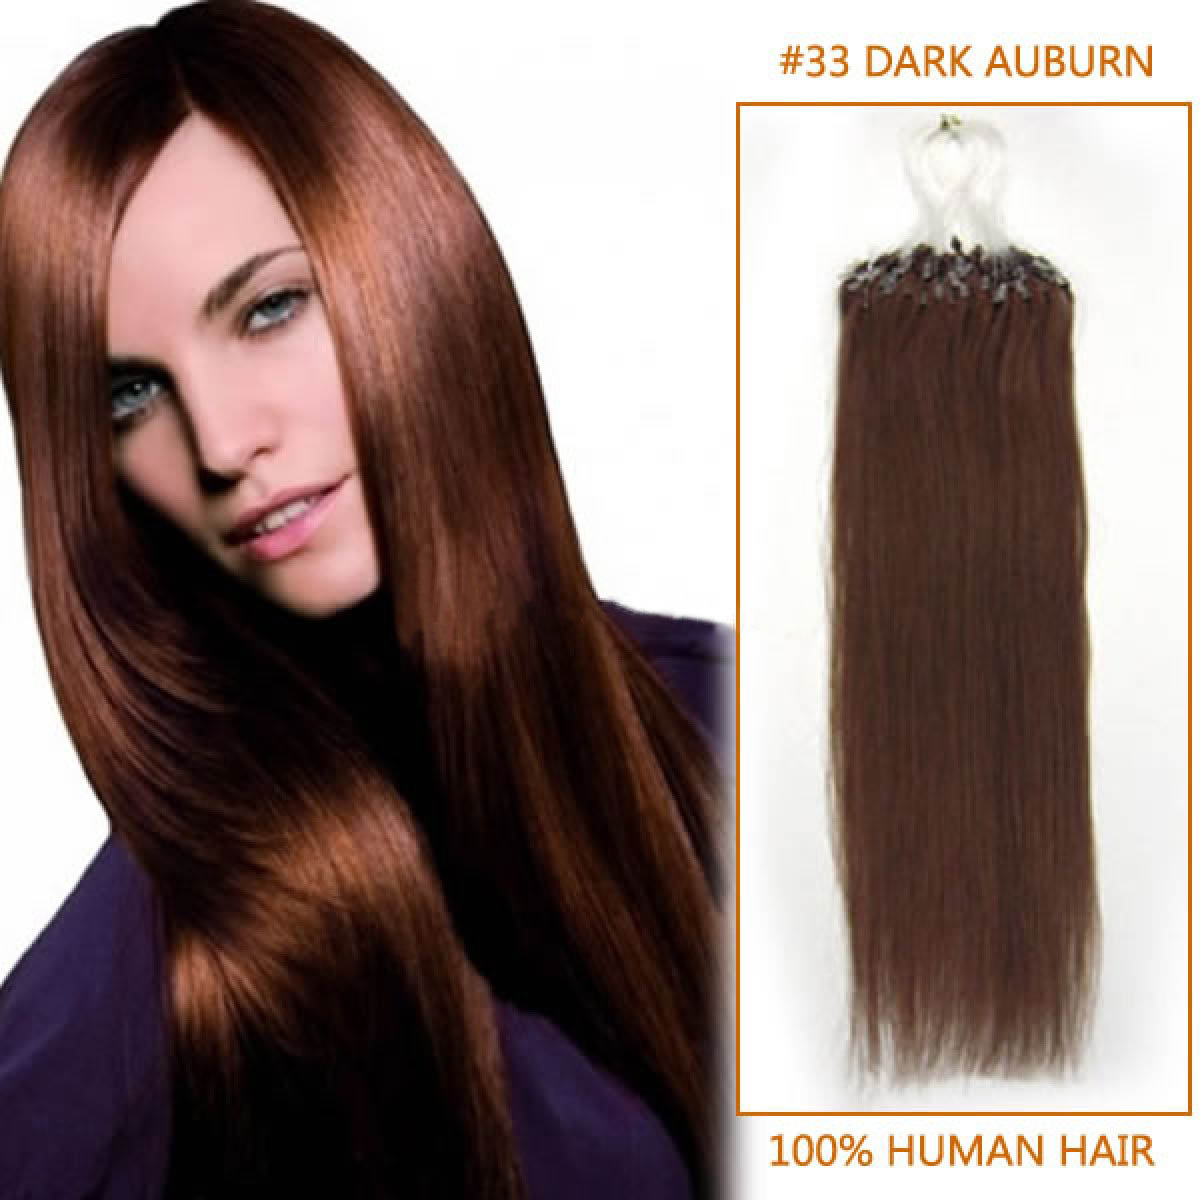 24 Inch 33 Dark Auburn Micro Loop Human Hair Extensions 100s 100g